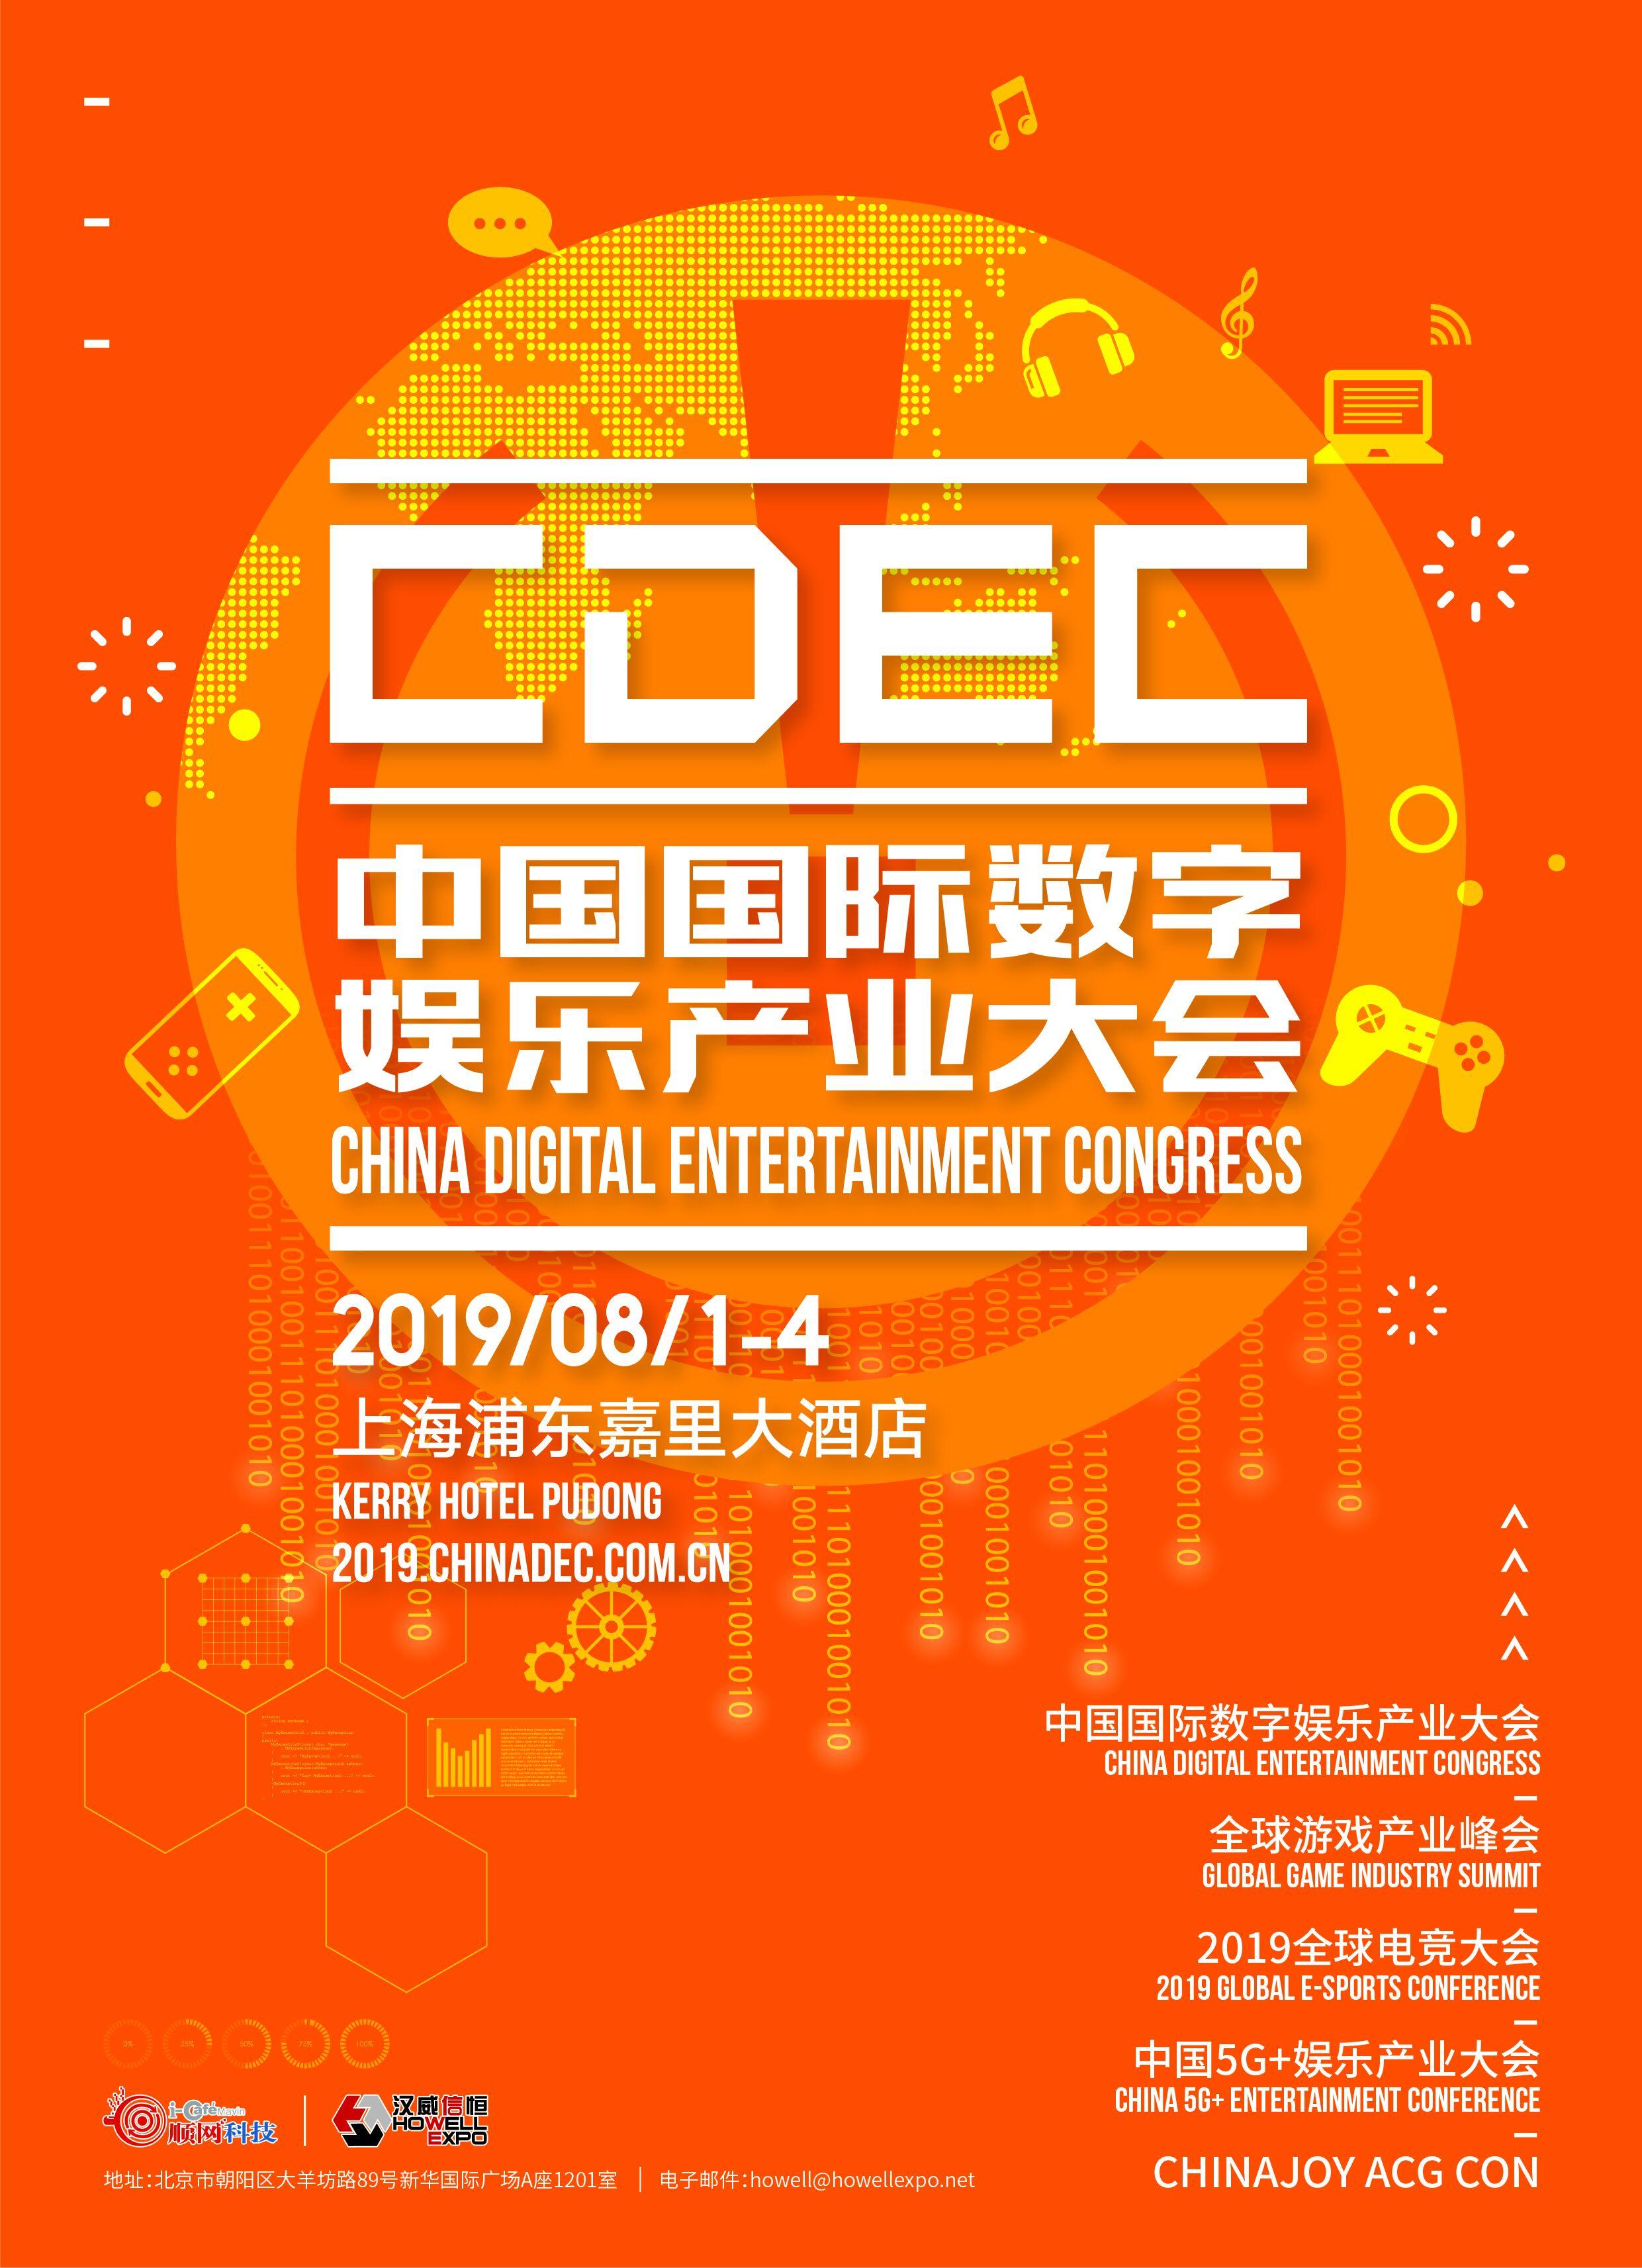 二次元盛世 CHINAJOY ACG CON今夏火熱開幕